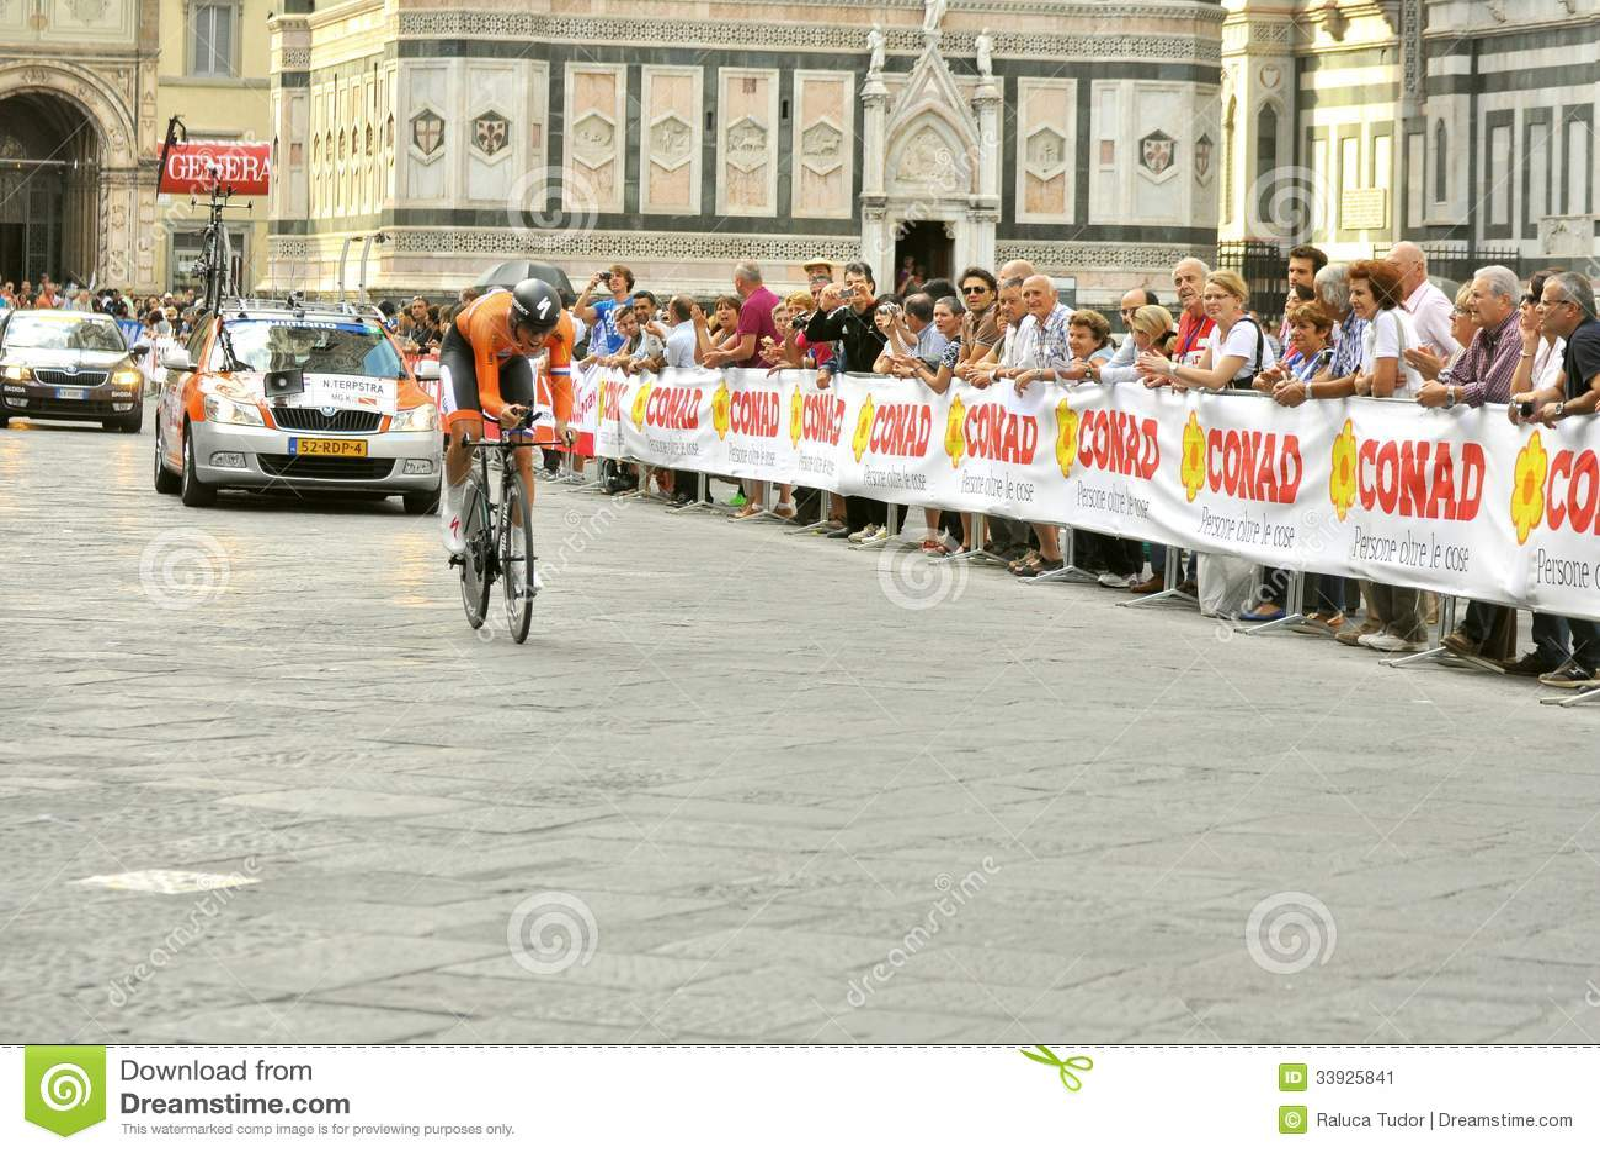 The Cyclist Niki Terpstra